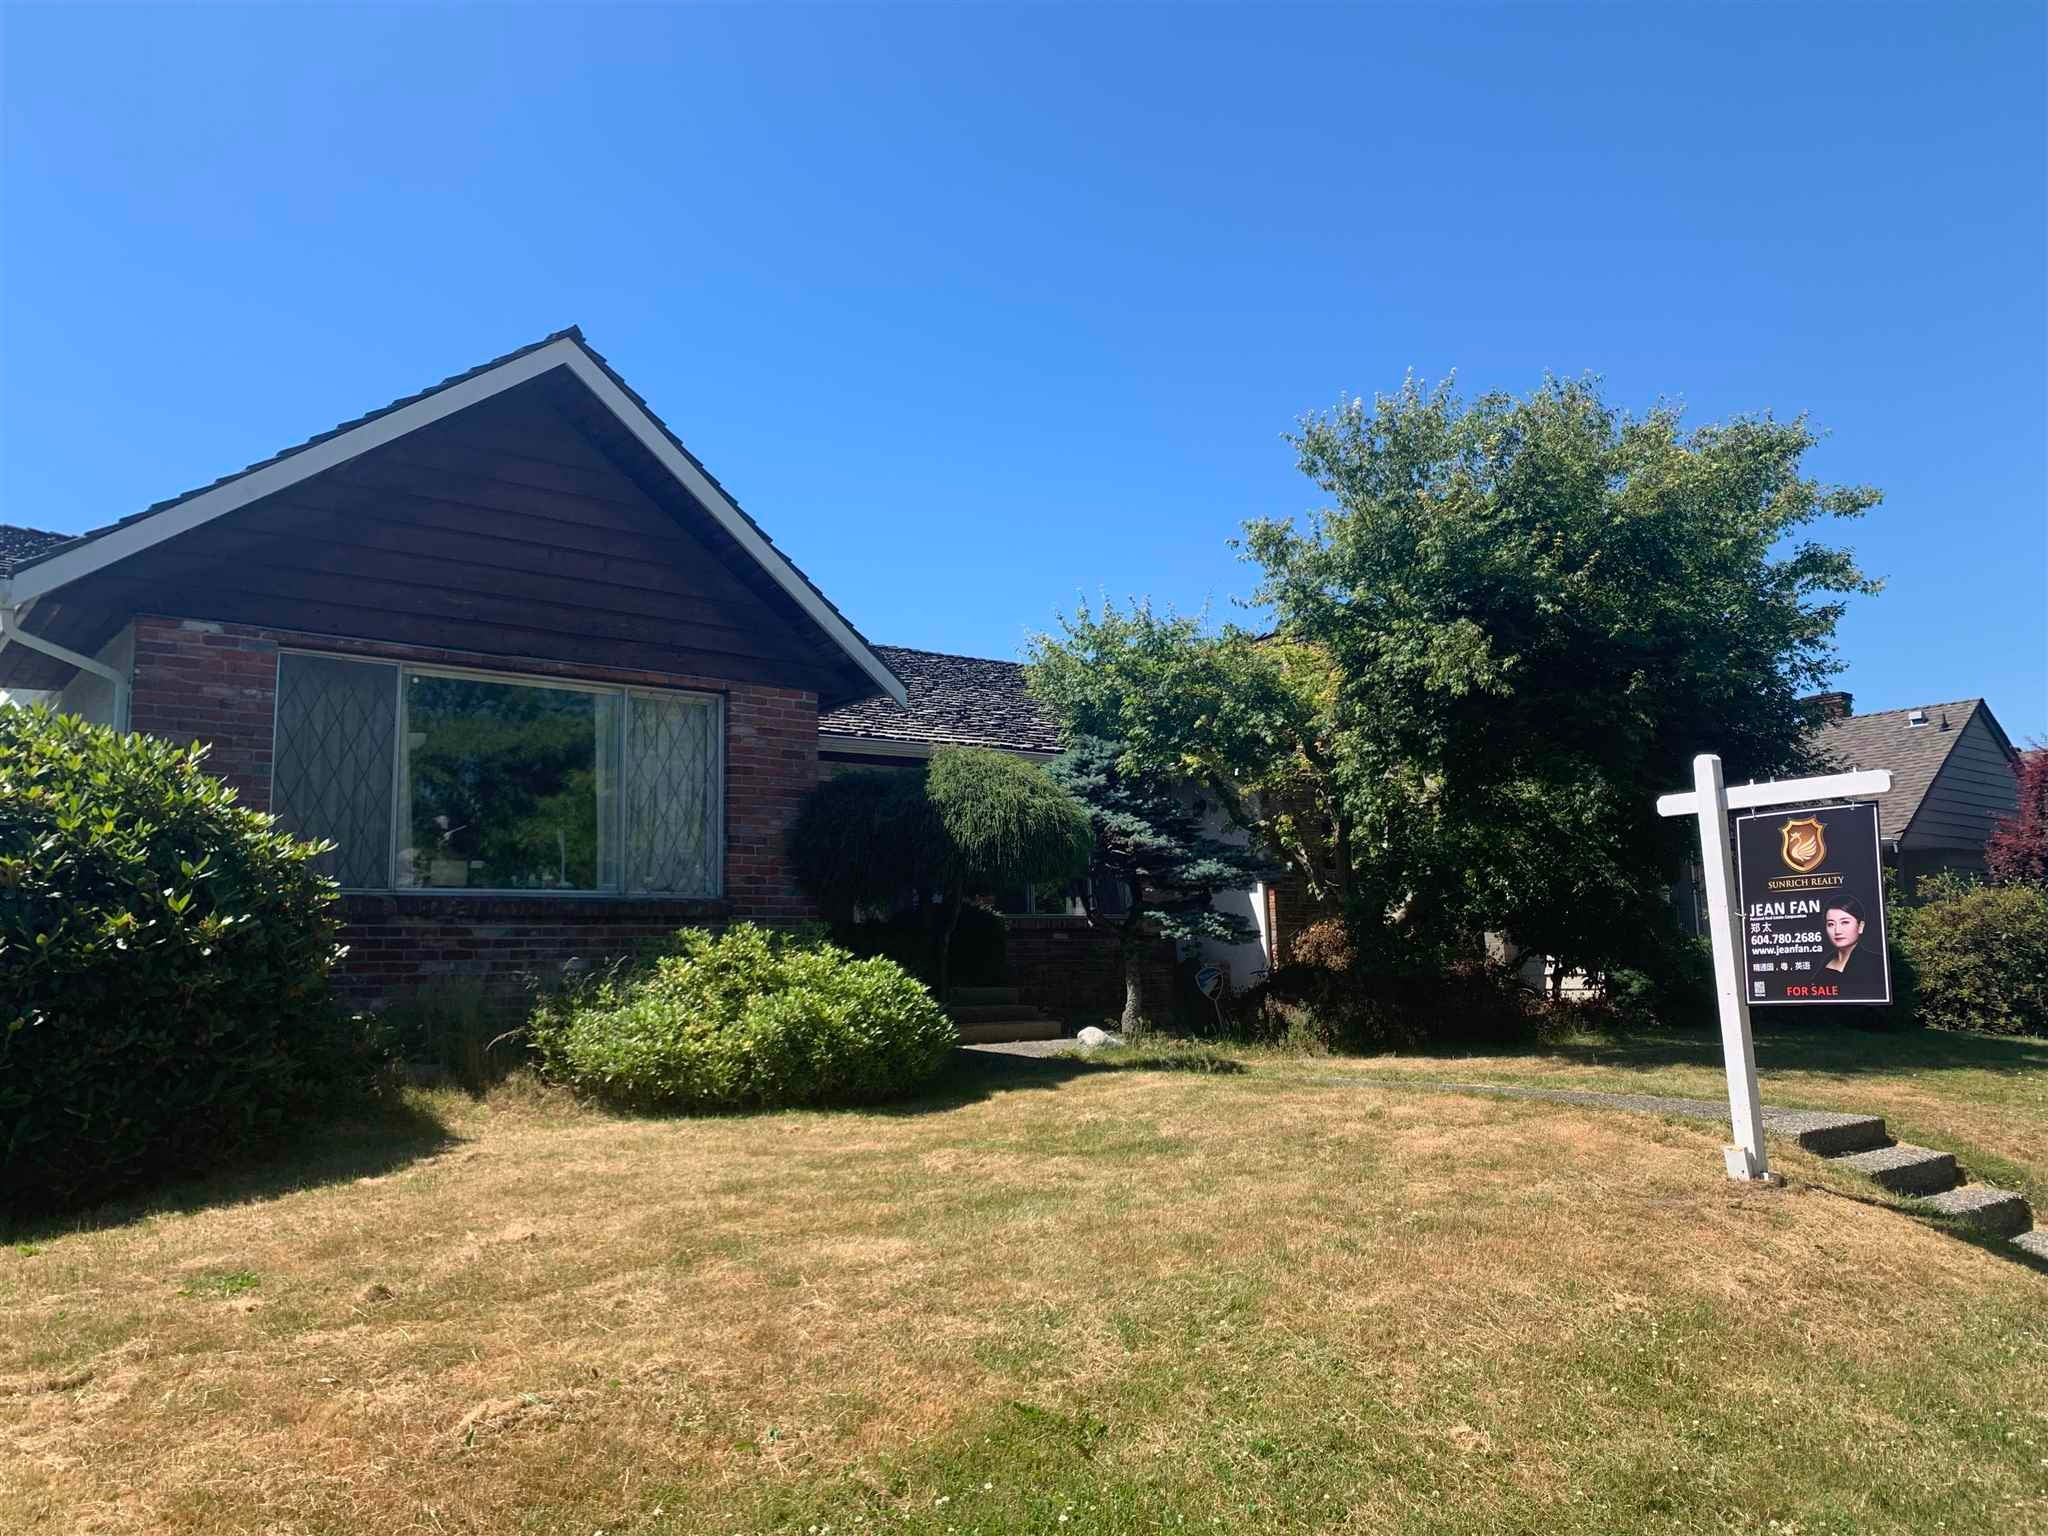 6091 WILLOW STREET - Oakridge VW House/Single Family for sale, 3 Bedrooms (R2604557) - #1